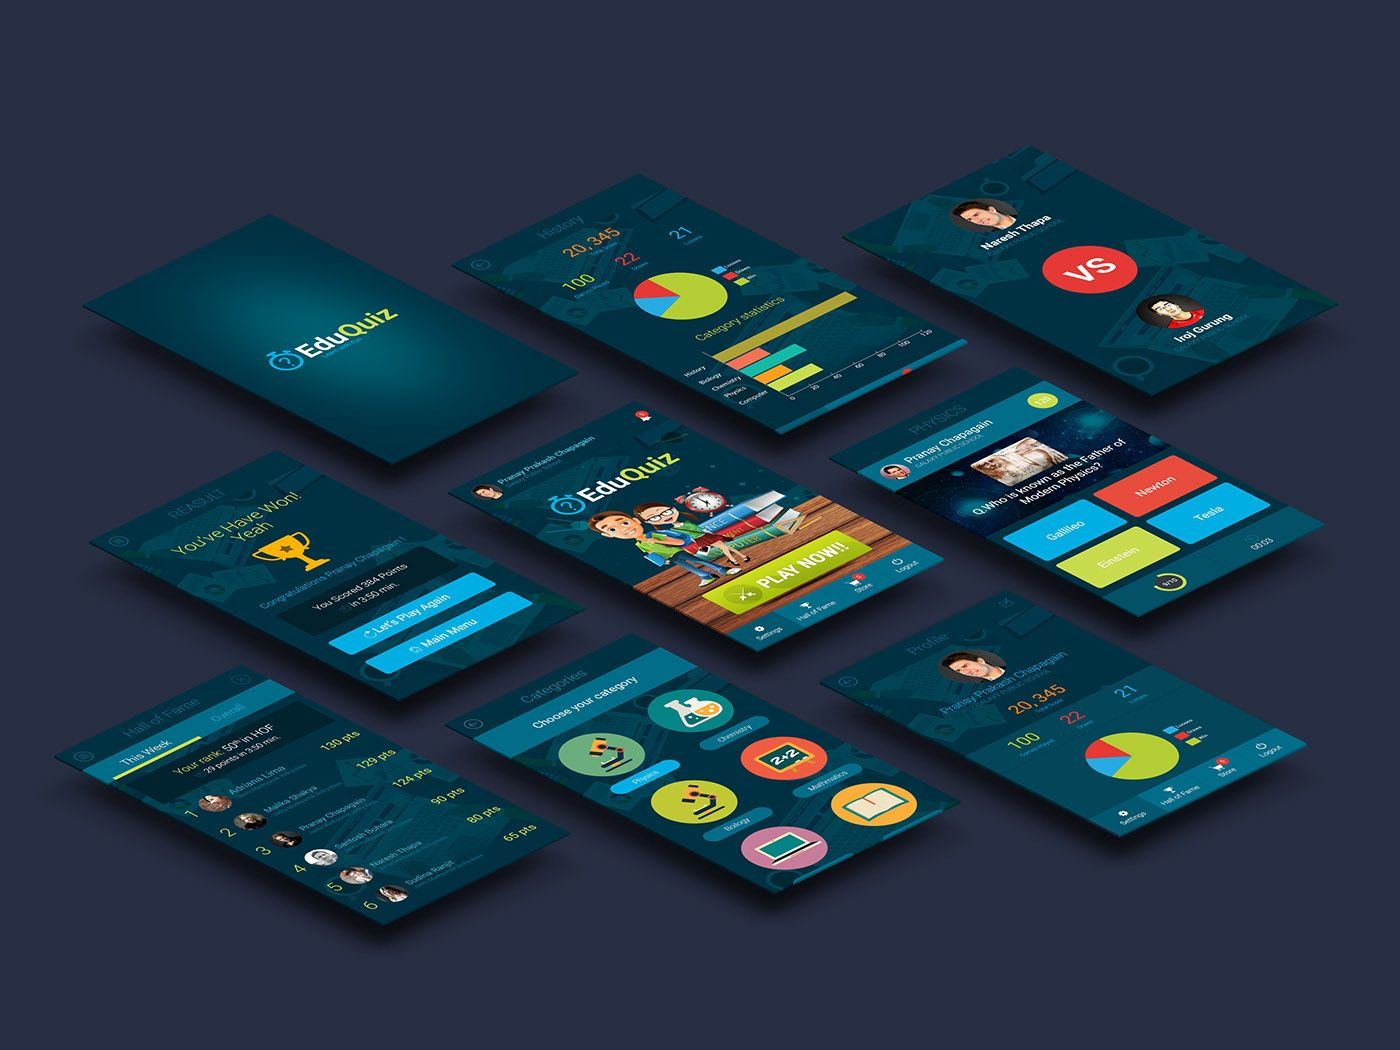 Quiz App for Students Mobile UI/UX Design on Behance